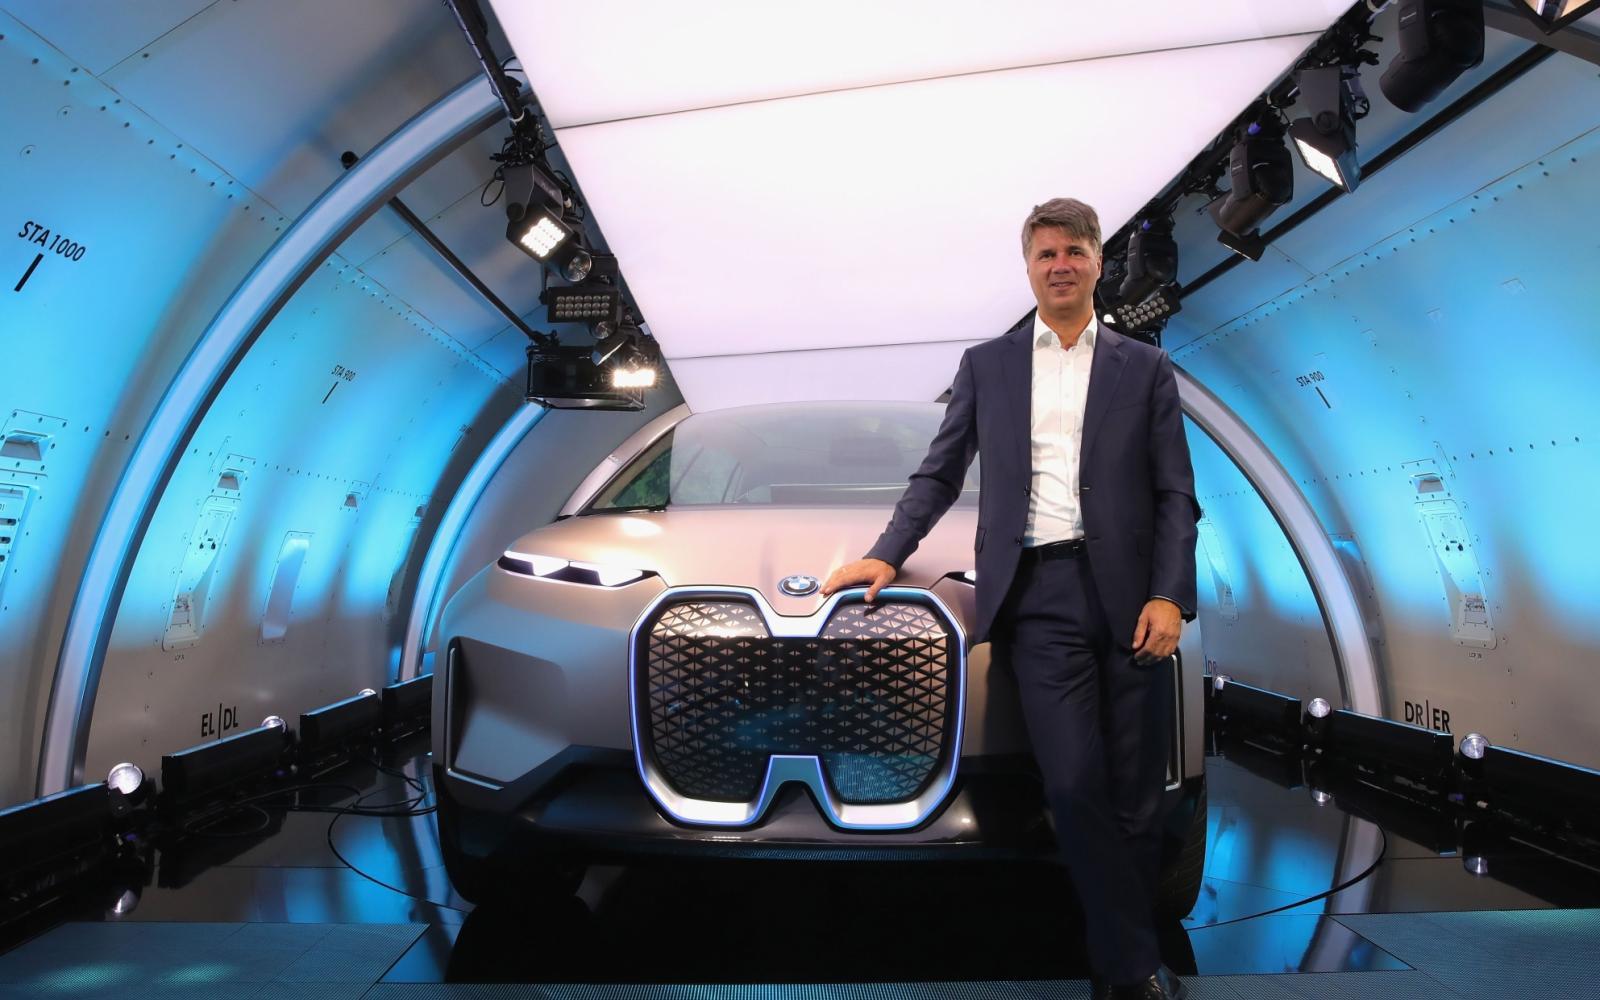 Dat is snel! BMW-baas Harald Krüger treedt al na vier jaar af